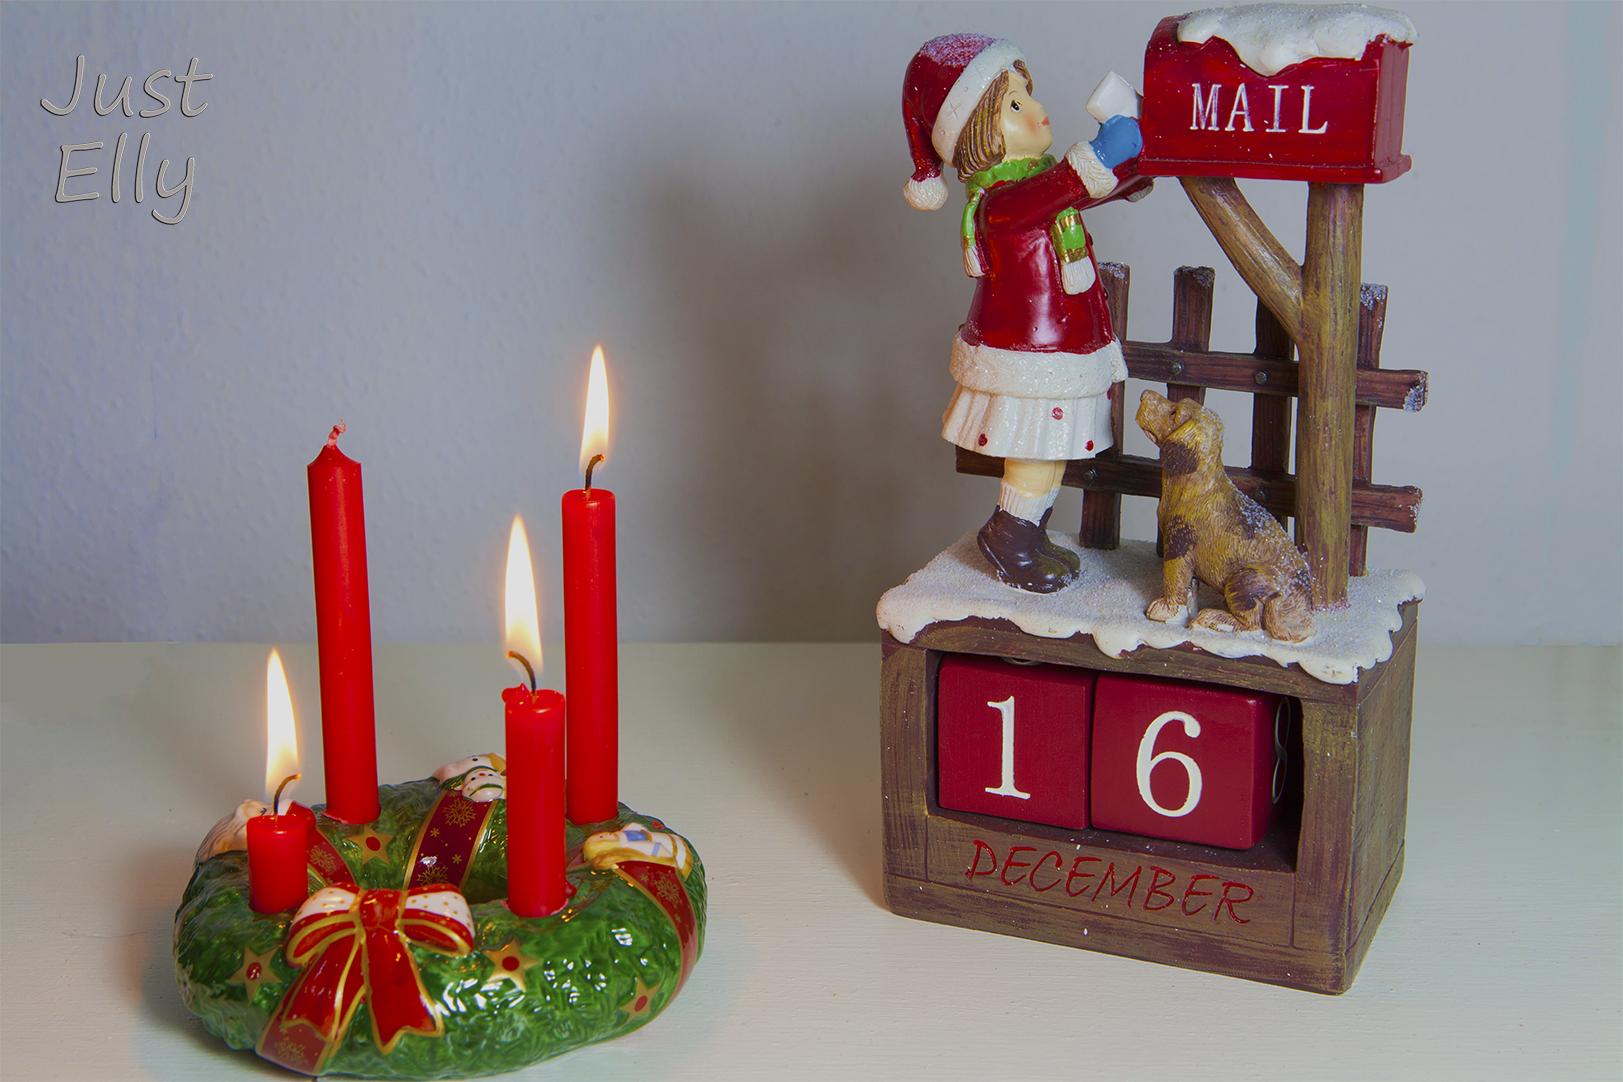 December 16th - My advent calendar